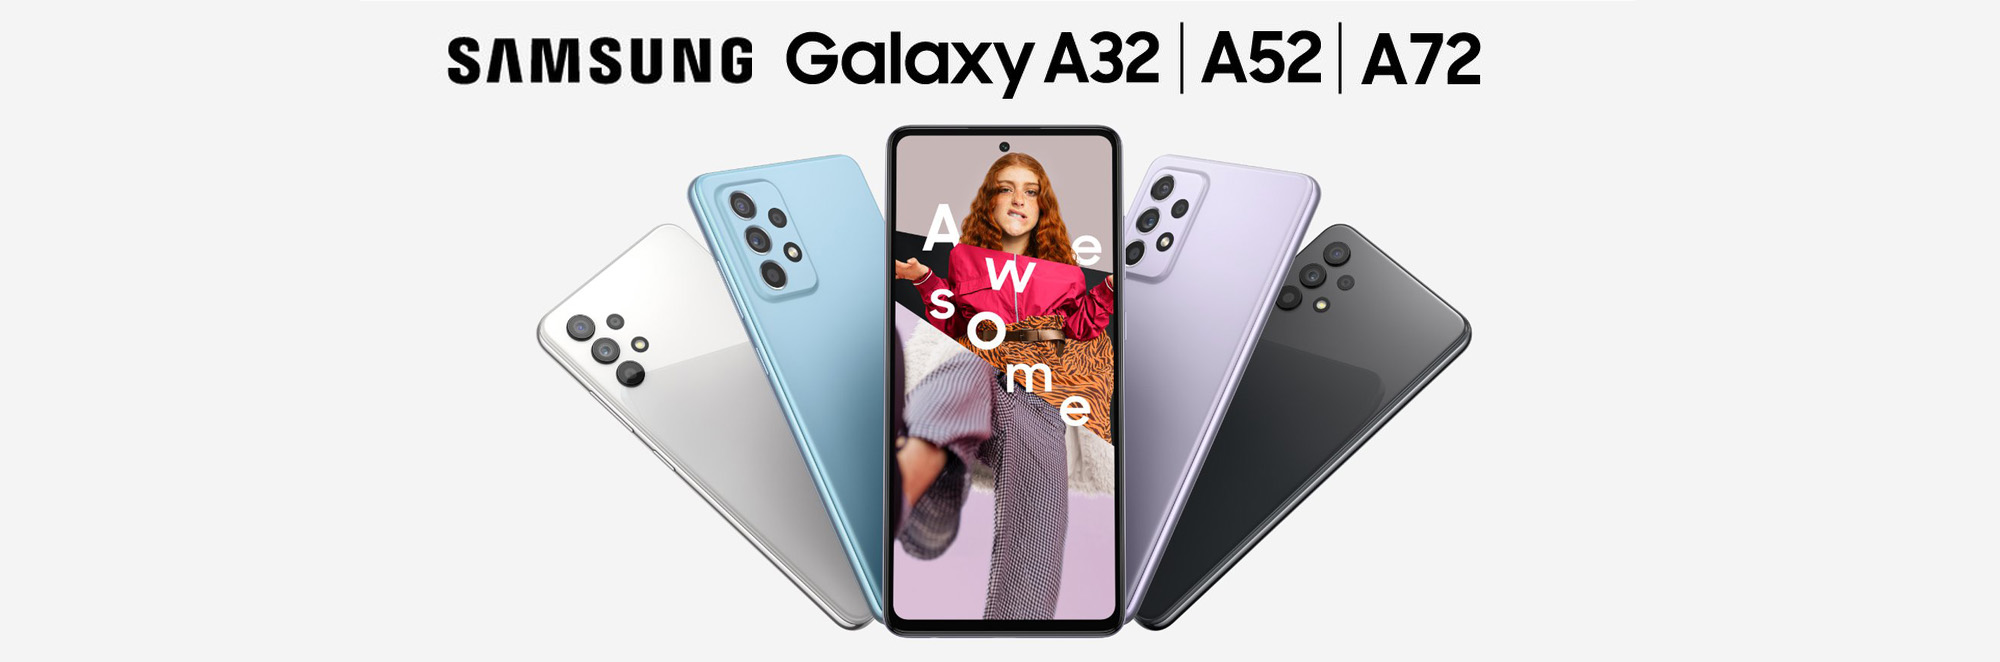 1708985-1627642888